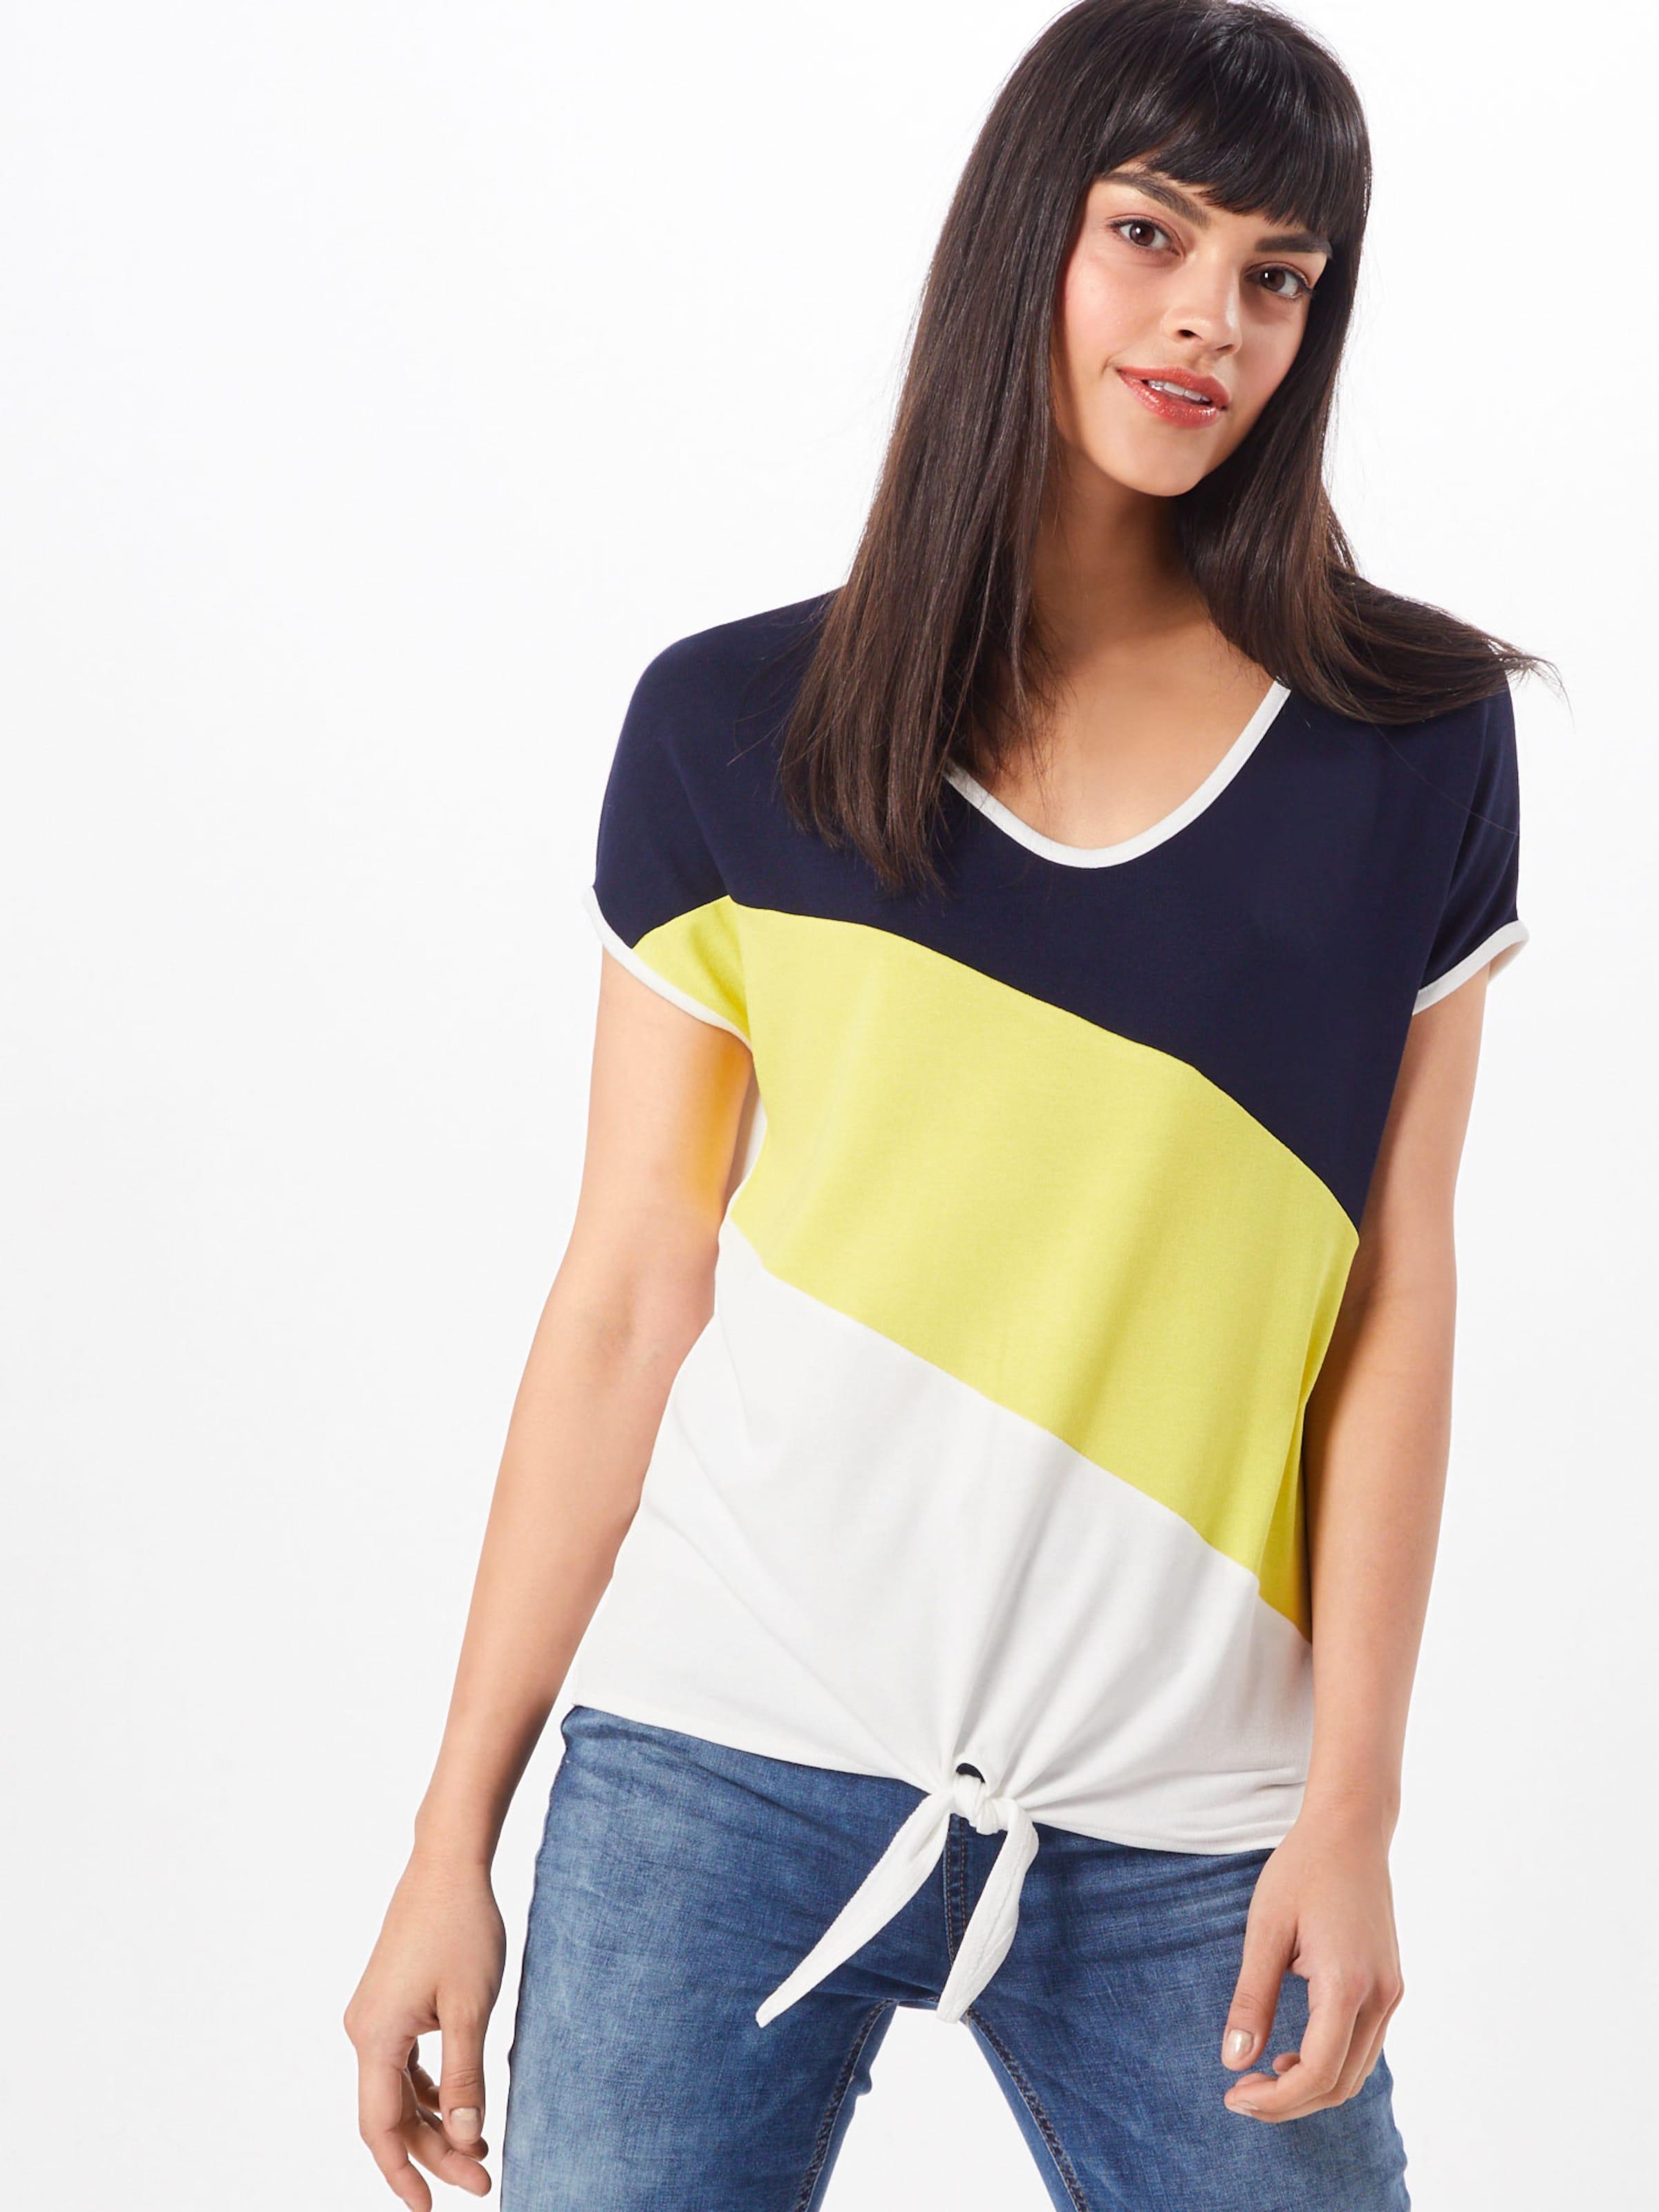 One 'ramona' shirt Cassé Blanc T Street JauneNoir En I9WDE2H